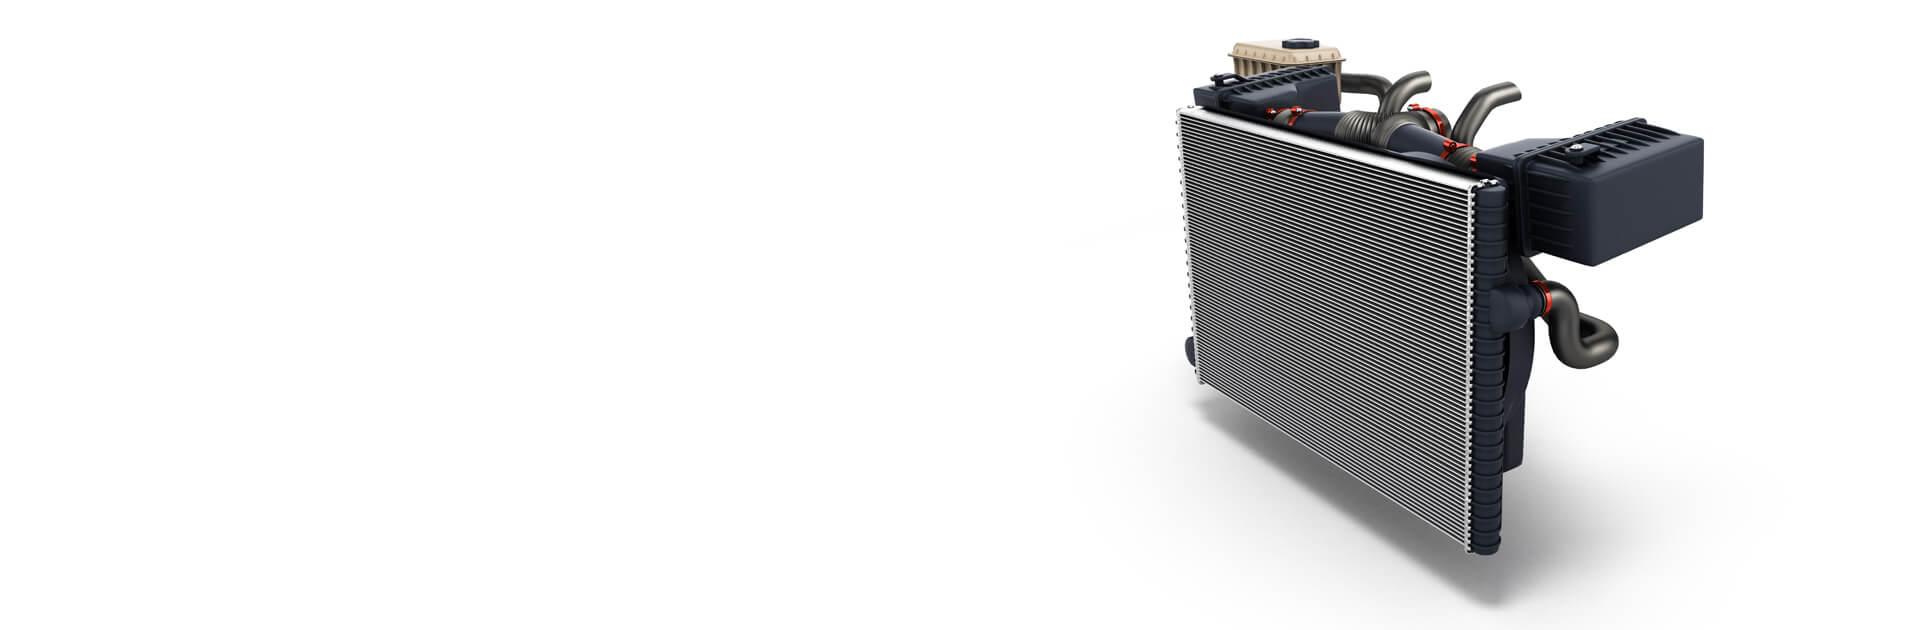 Radiator-GAS Reach Cooling 41-1707